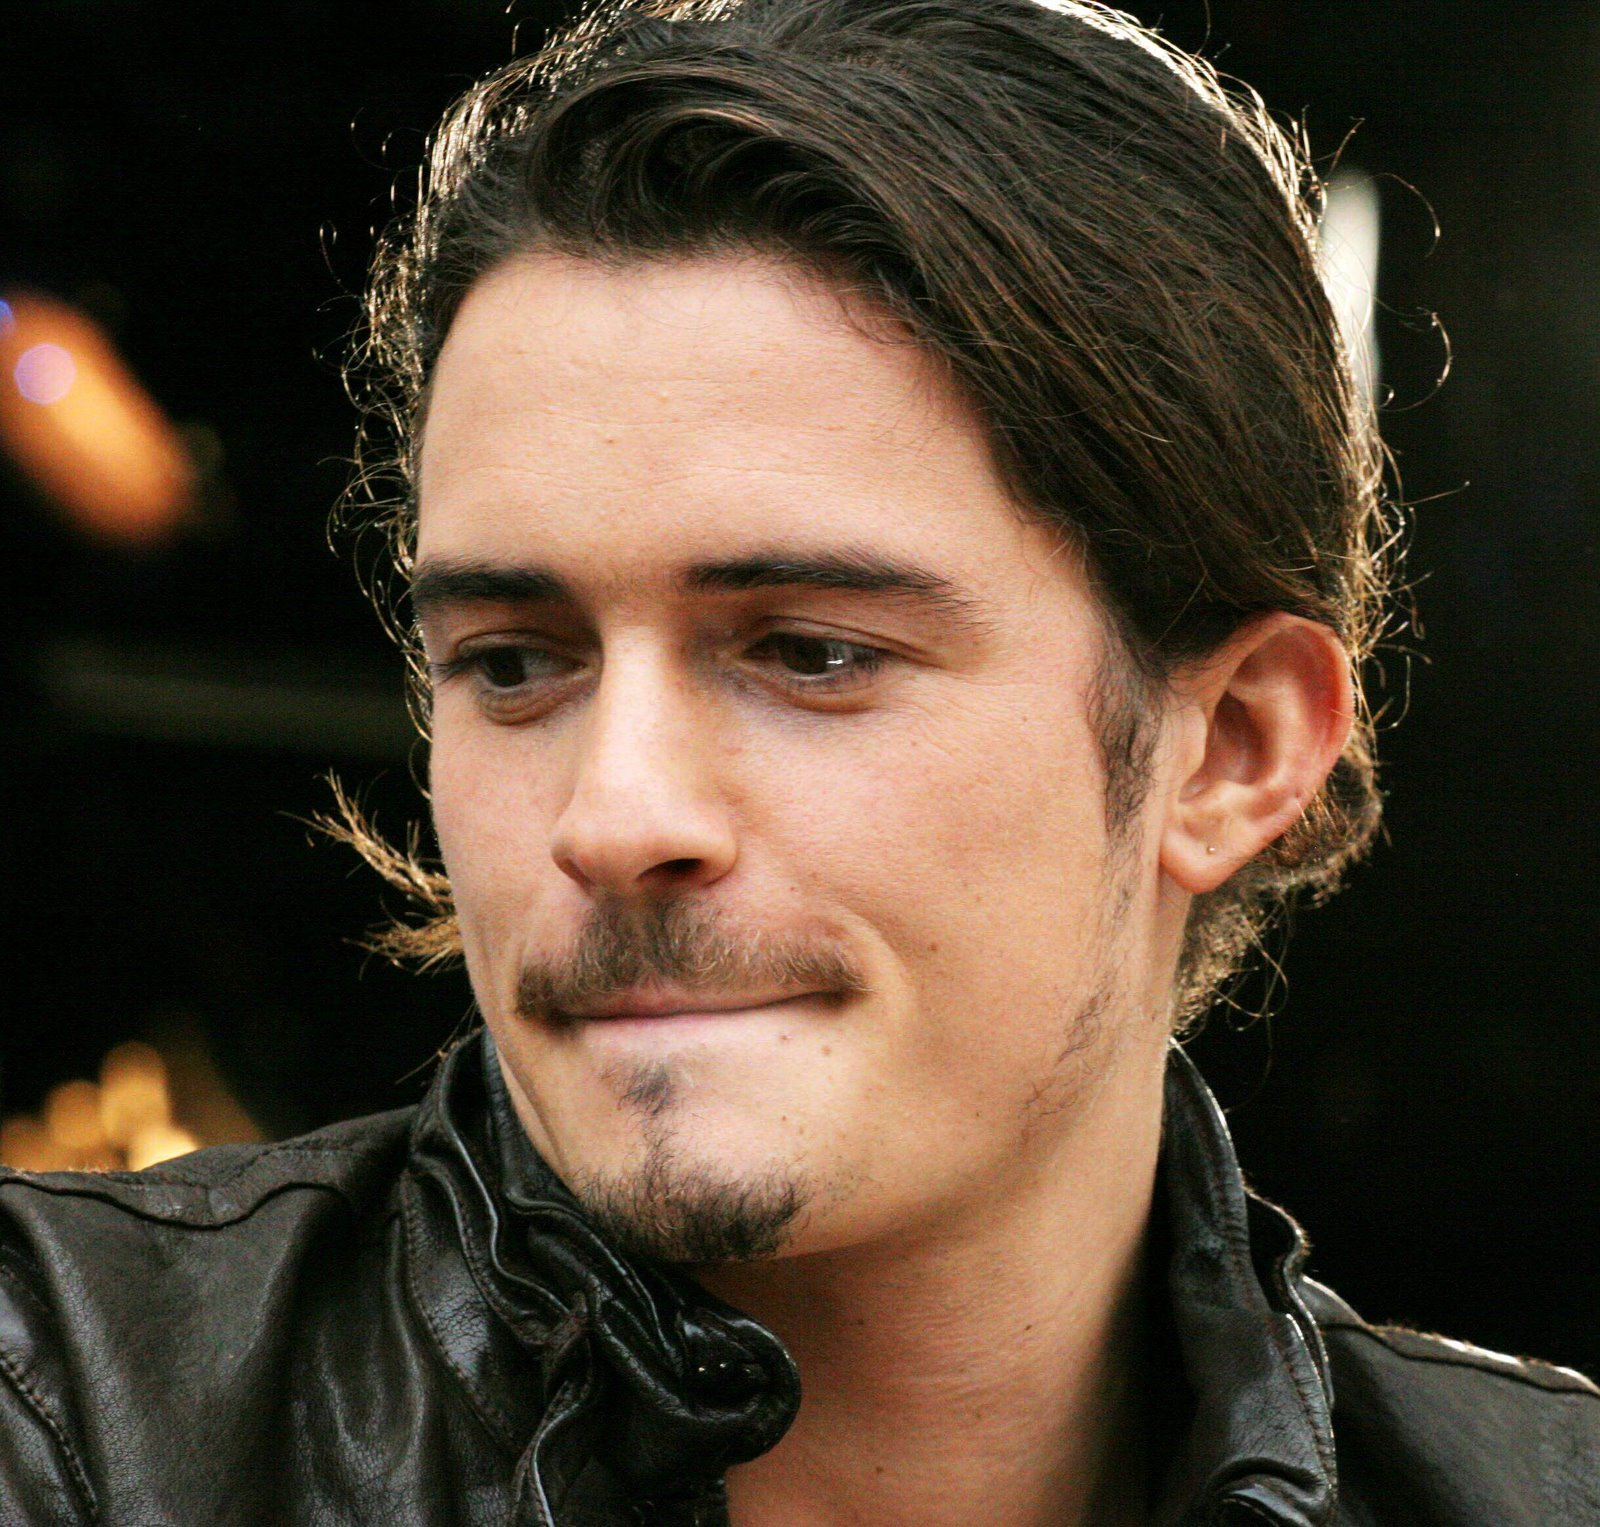 hairstyles for men: Orlando Bloom Hair - Blockbuster Star ...